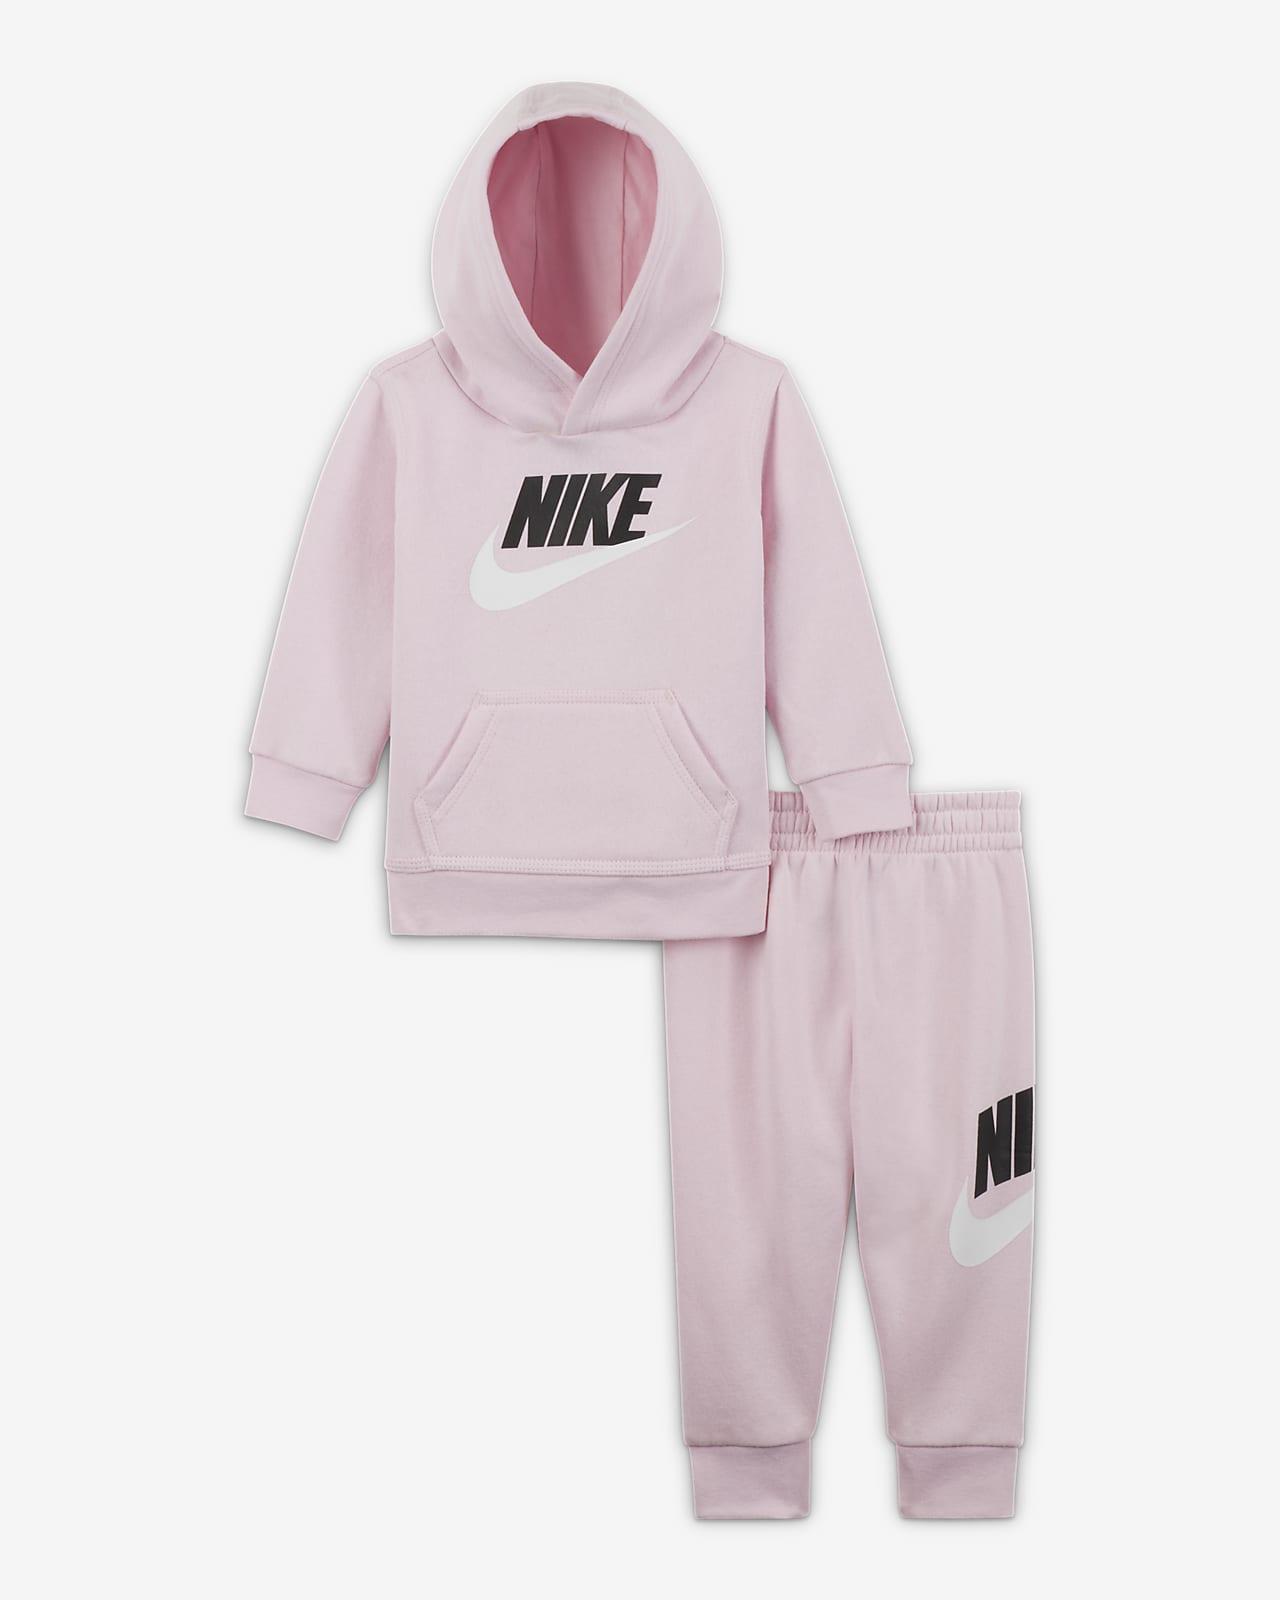 Nike Sportswear Club Fleece Baby (12–24M) Hoodie and Trousers Set